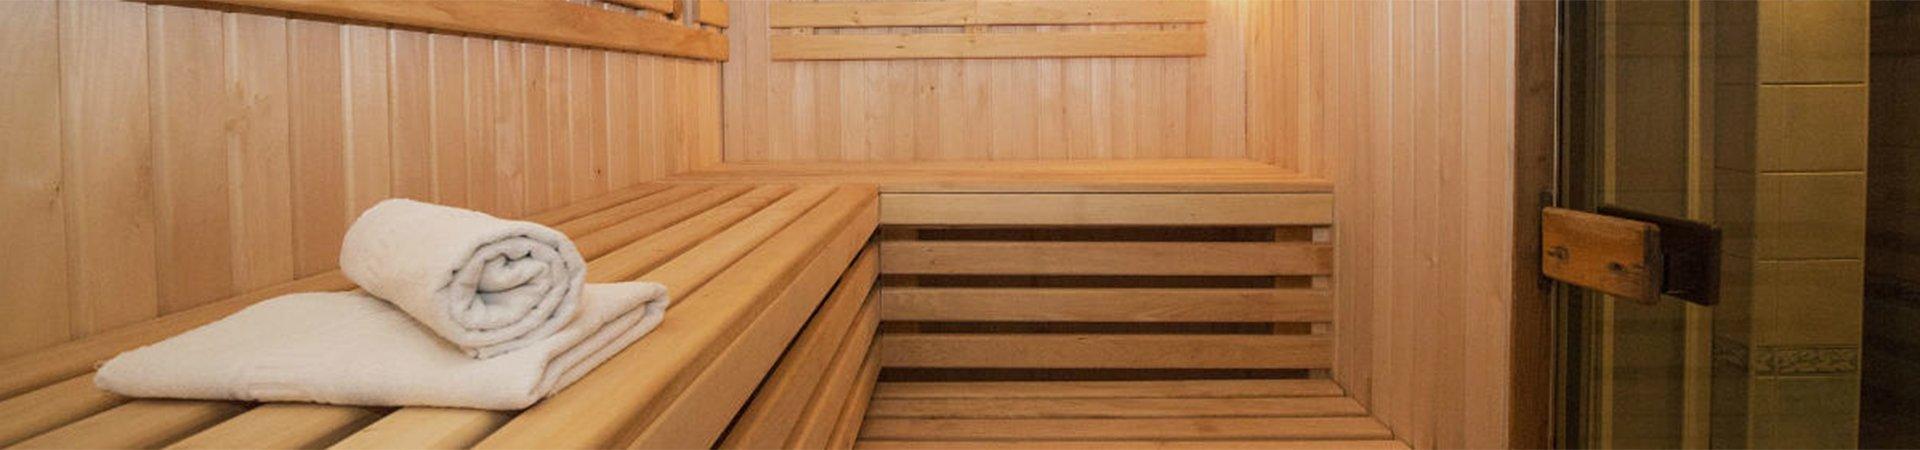 Sauna - Accesorios